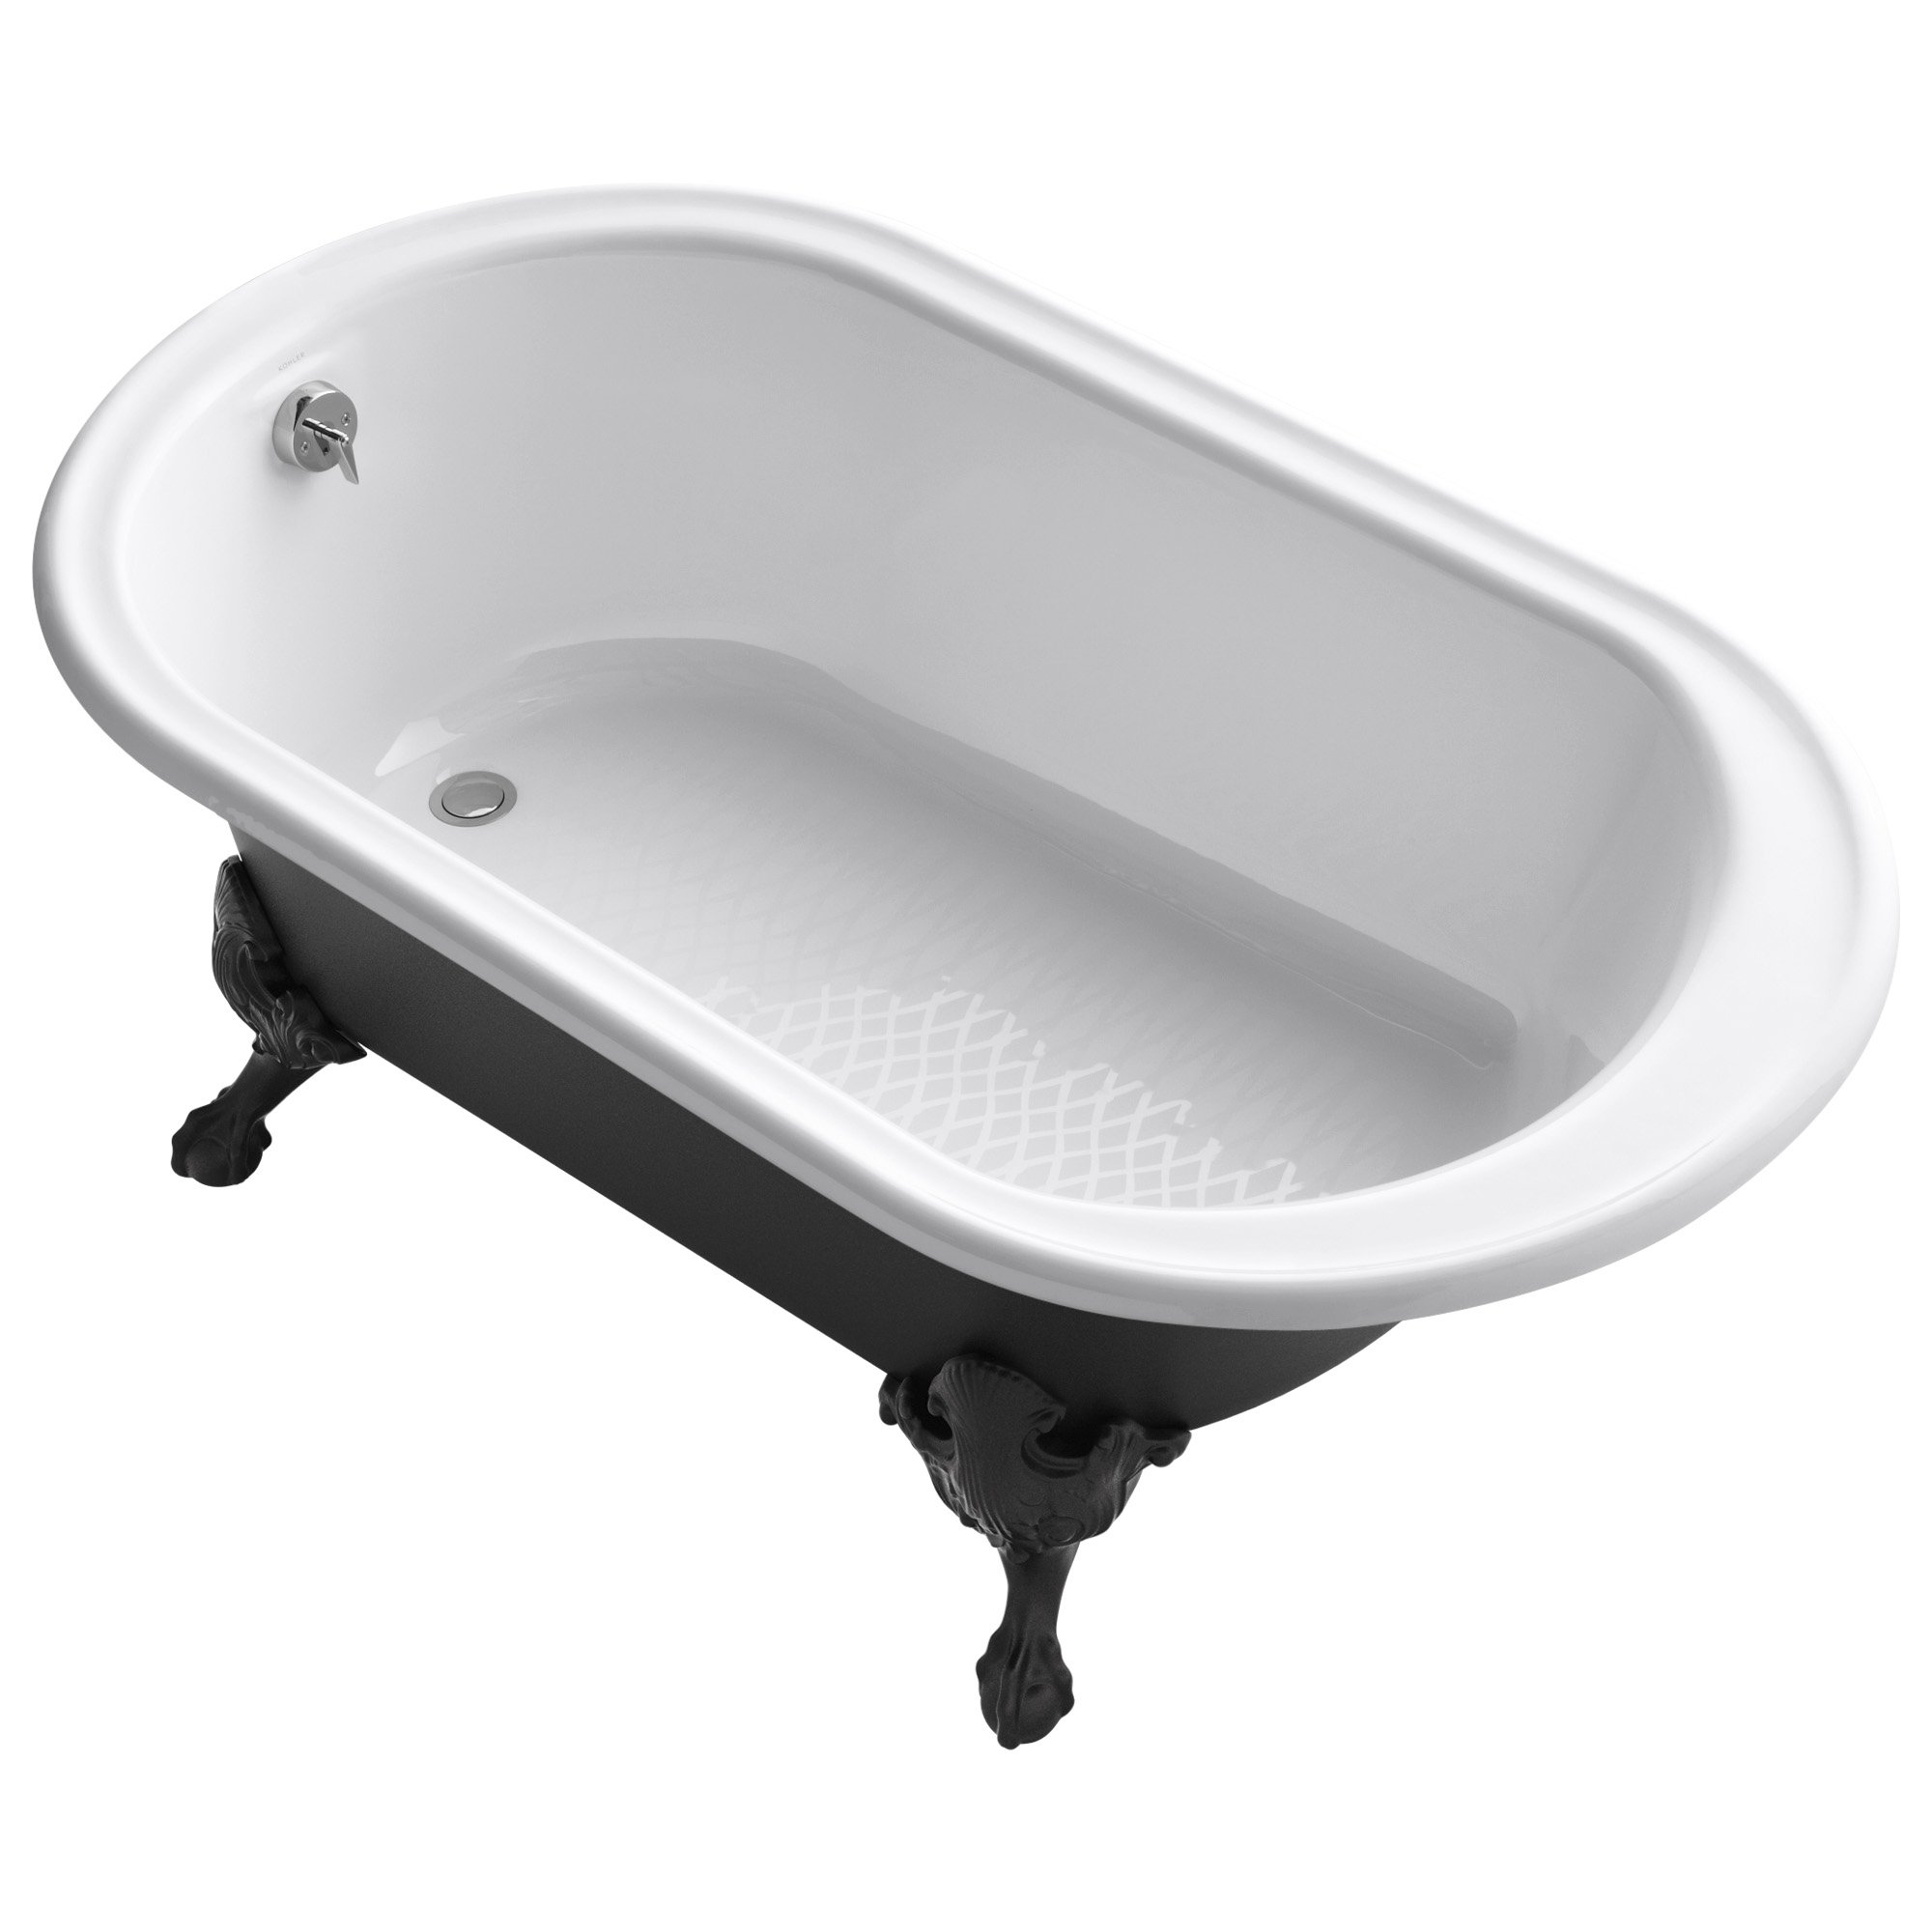 KOHLER K-710-P5-0 Iron Works Historic freestanding oval bath with reversible drain, Iron Black exterior & Safeguard finish, 66'' x 36'', White by Kohler (Image #1)